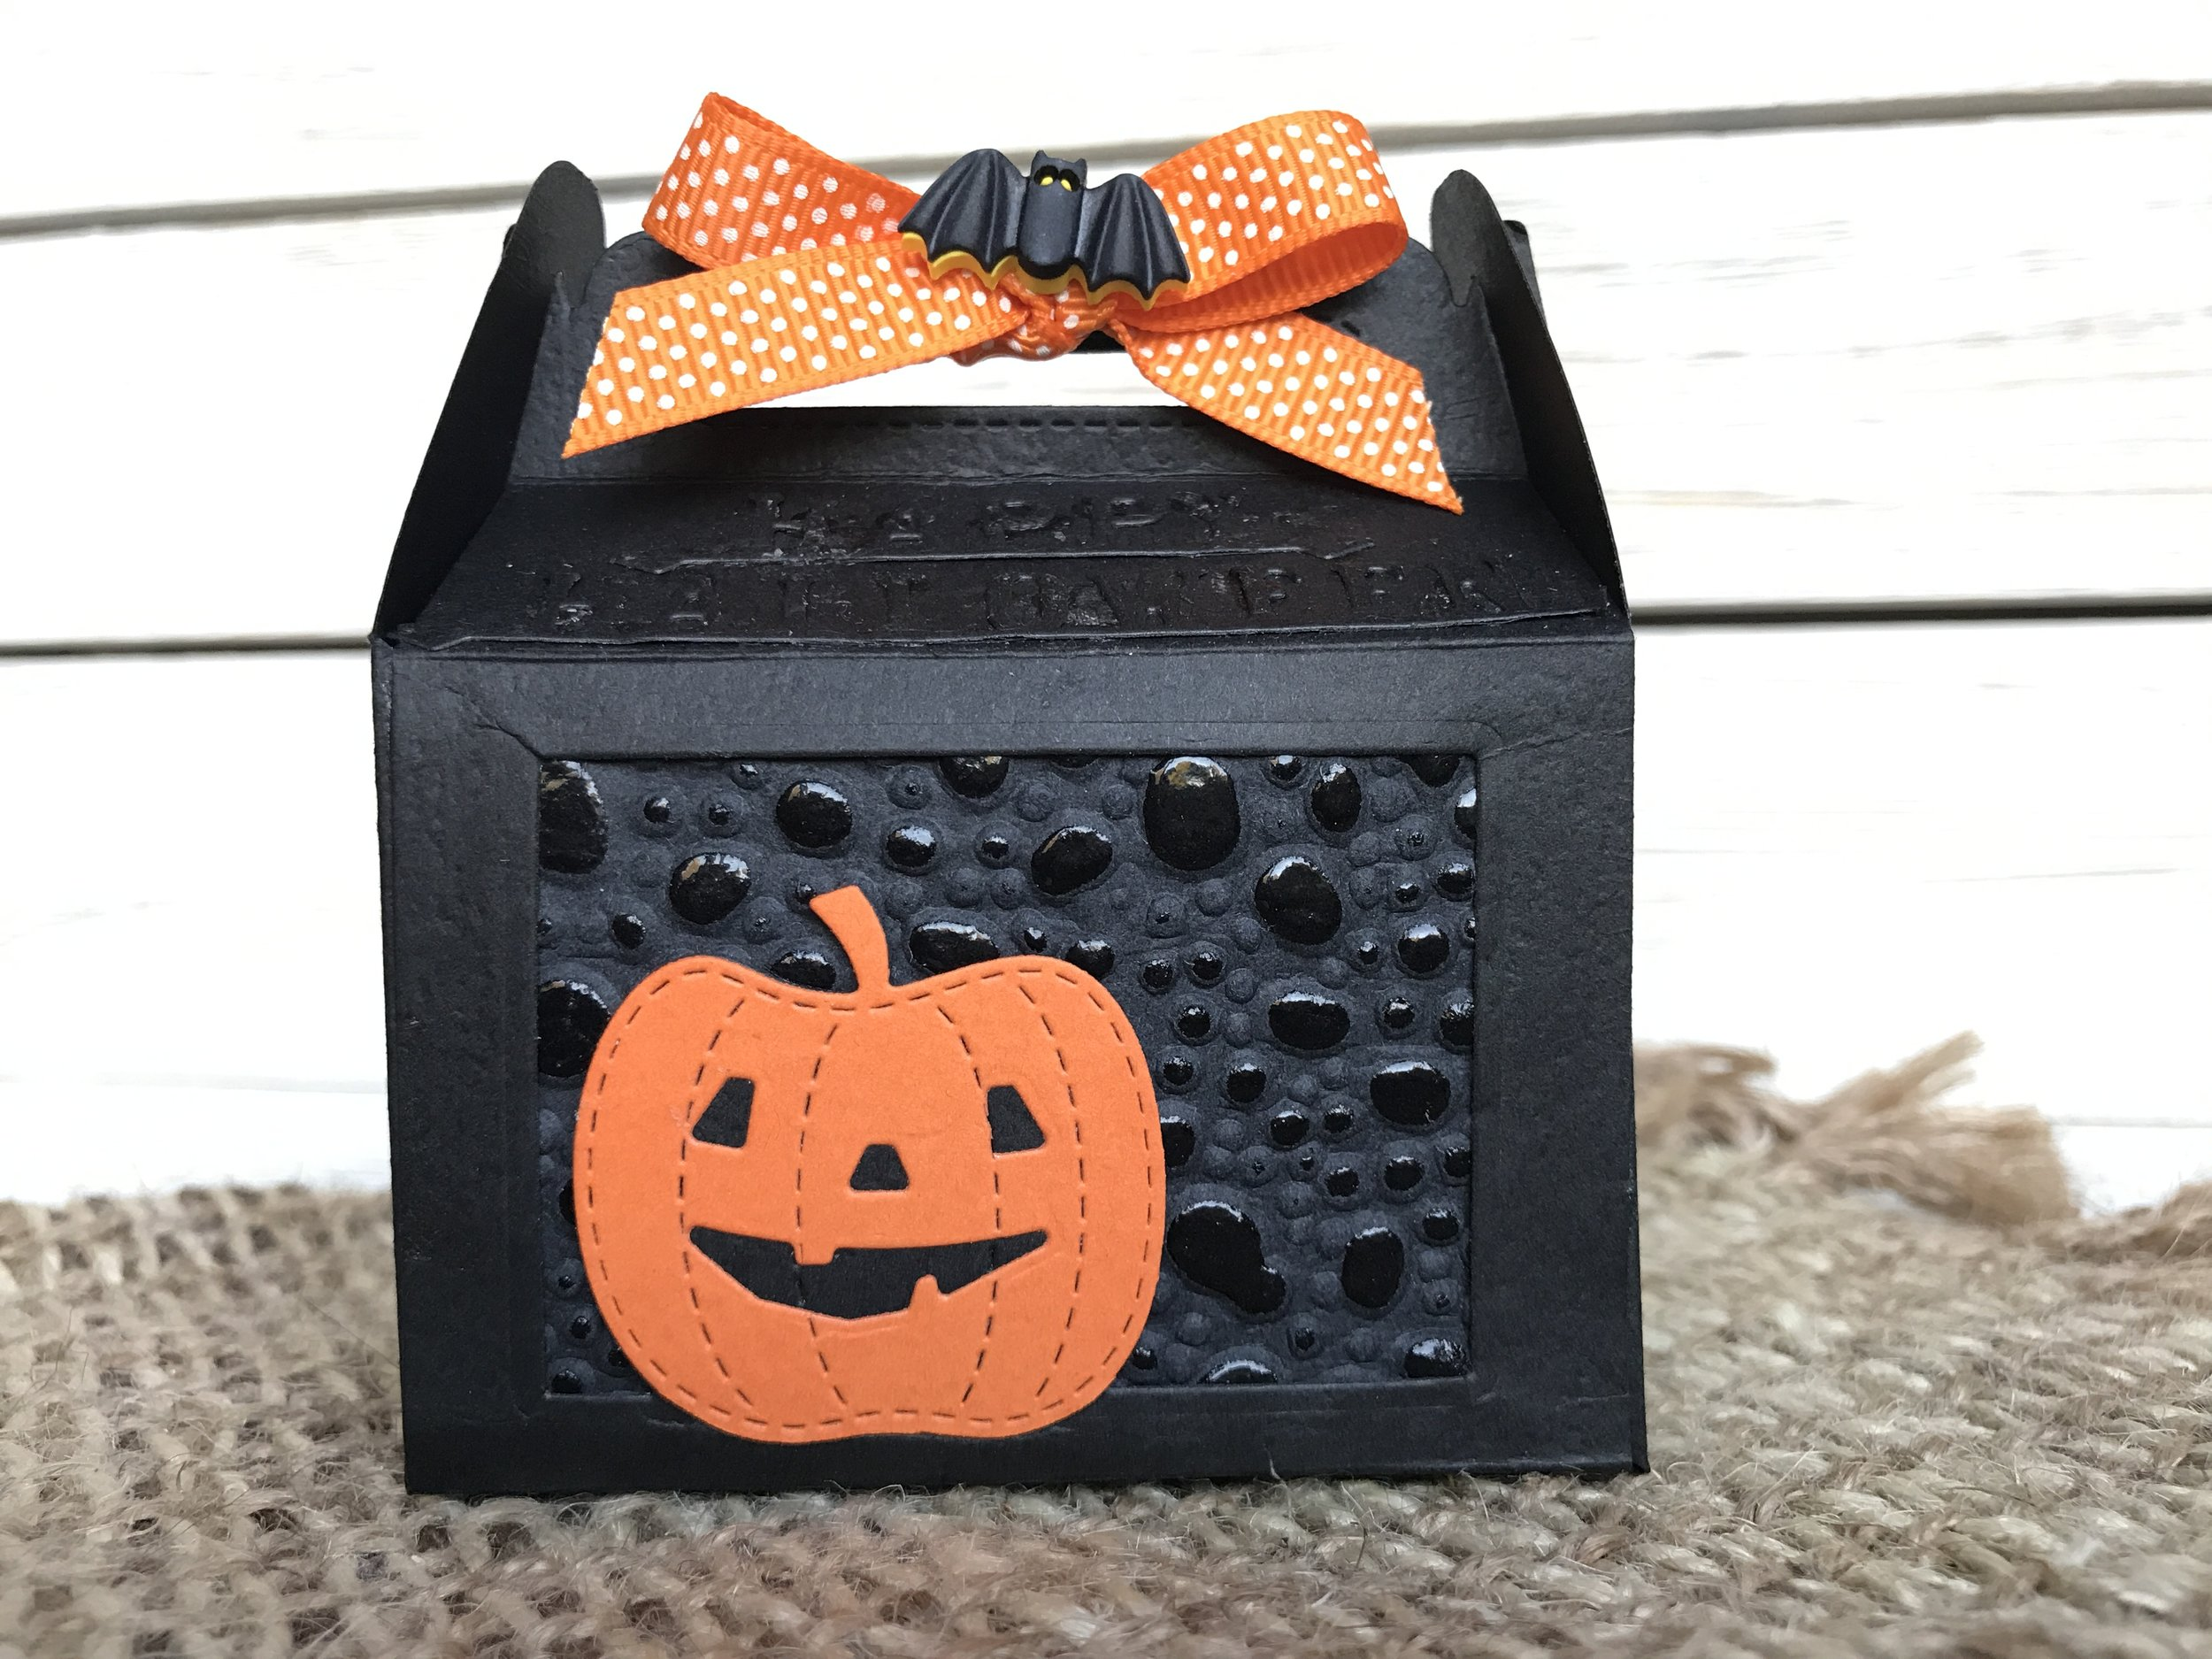 Halloween Jack-o-Lantern and Bat